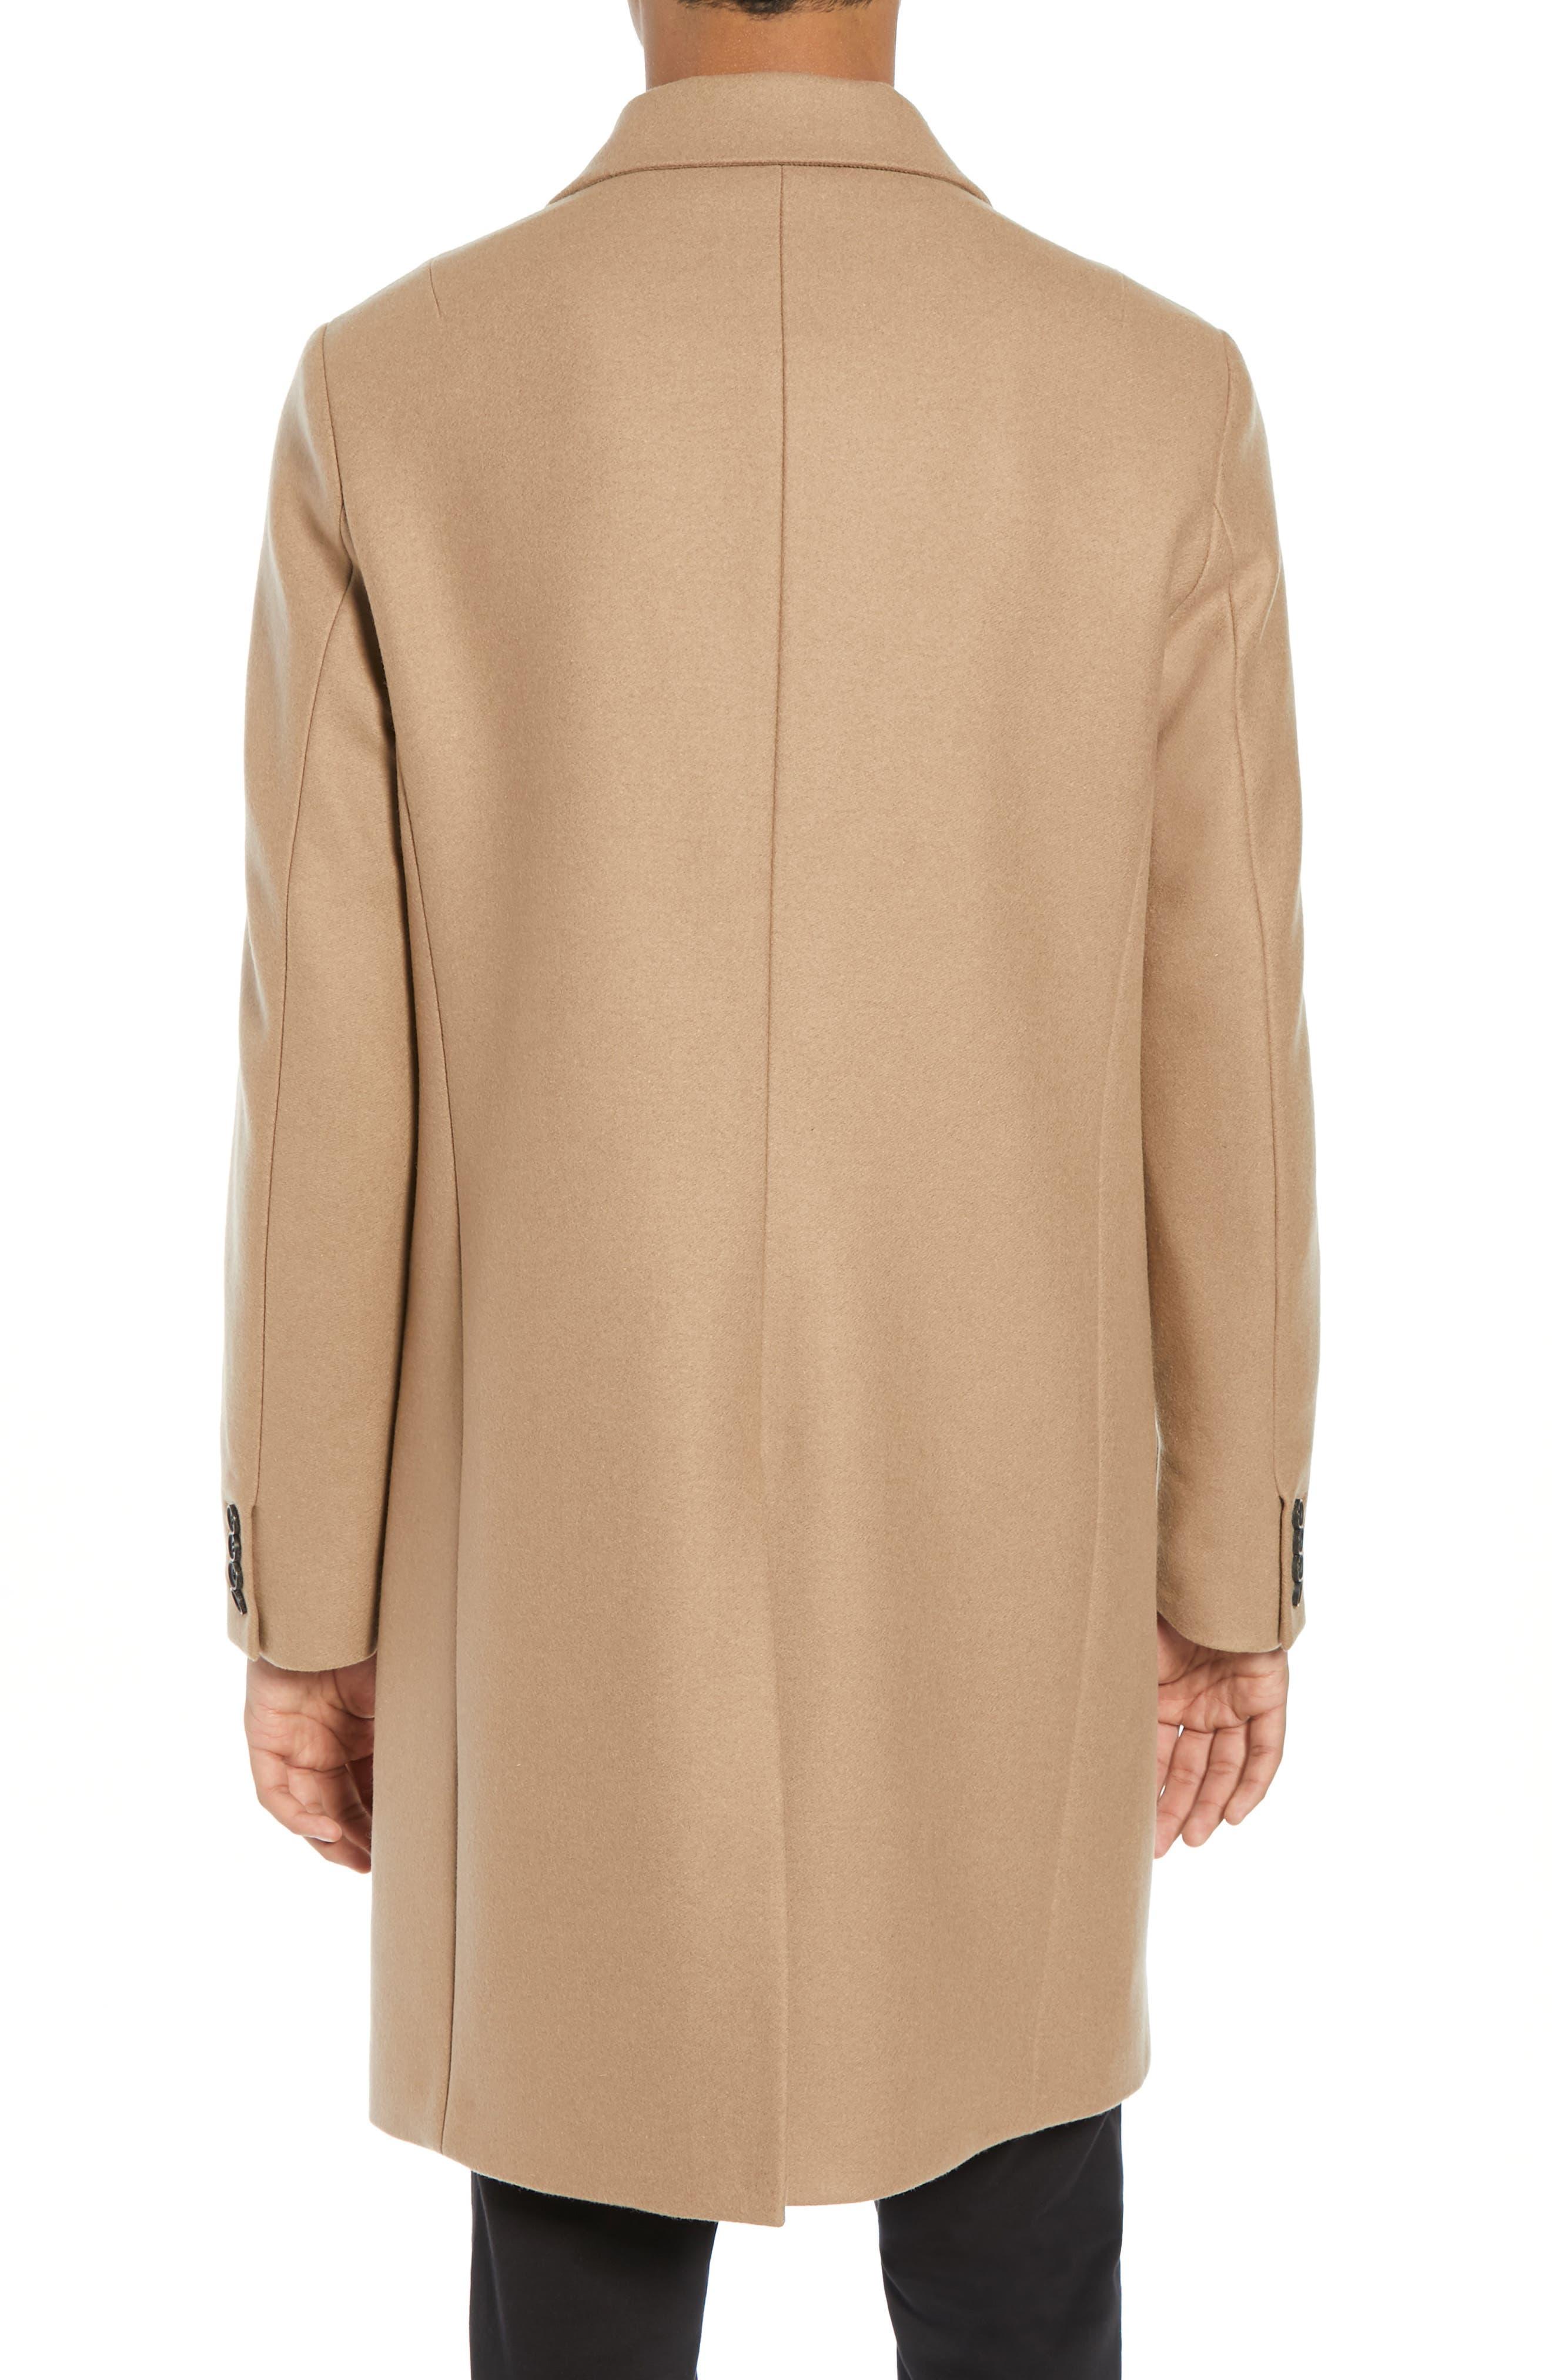 Tulsen Regular Fit Wool Topcoat,                             Alternate thumbnail 2, color,                             200